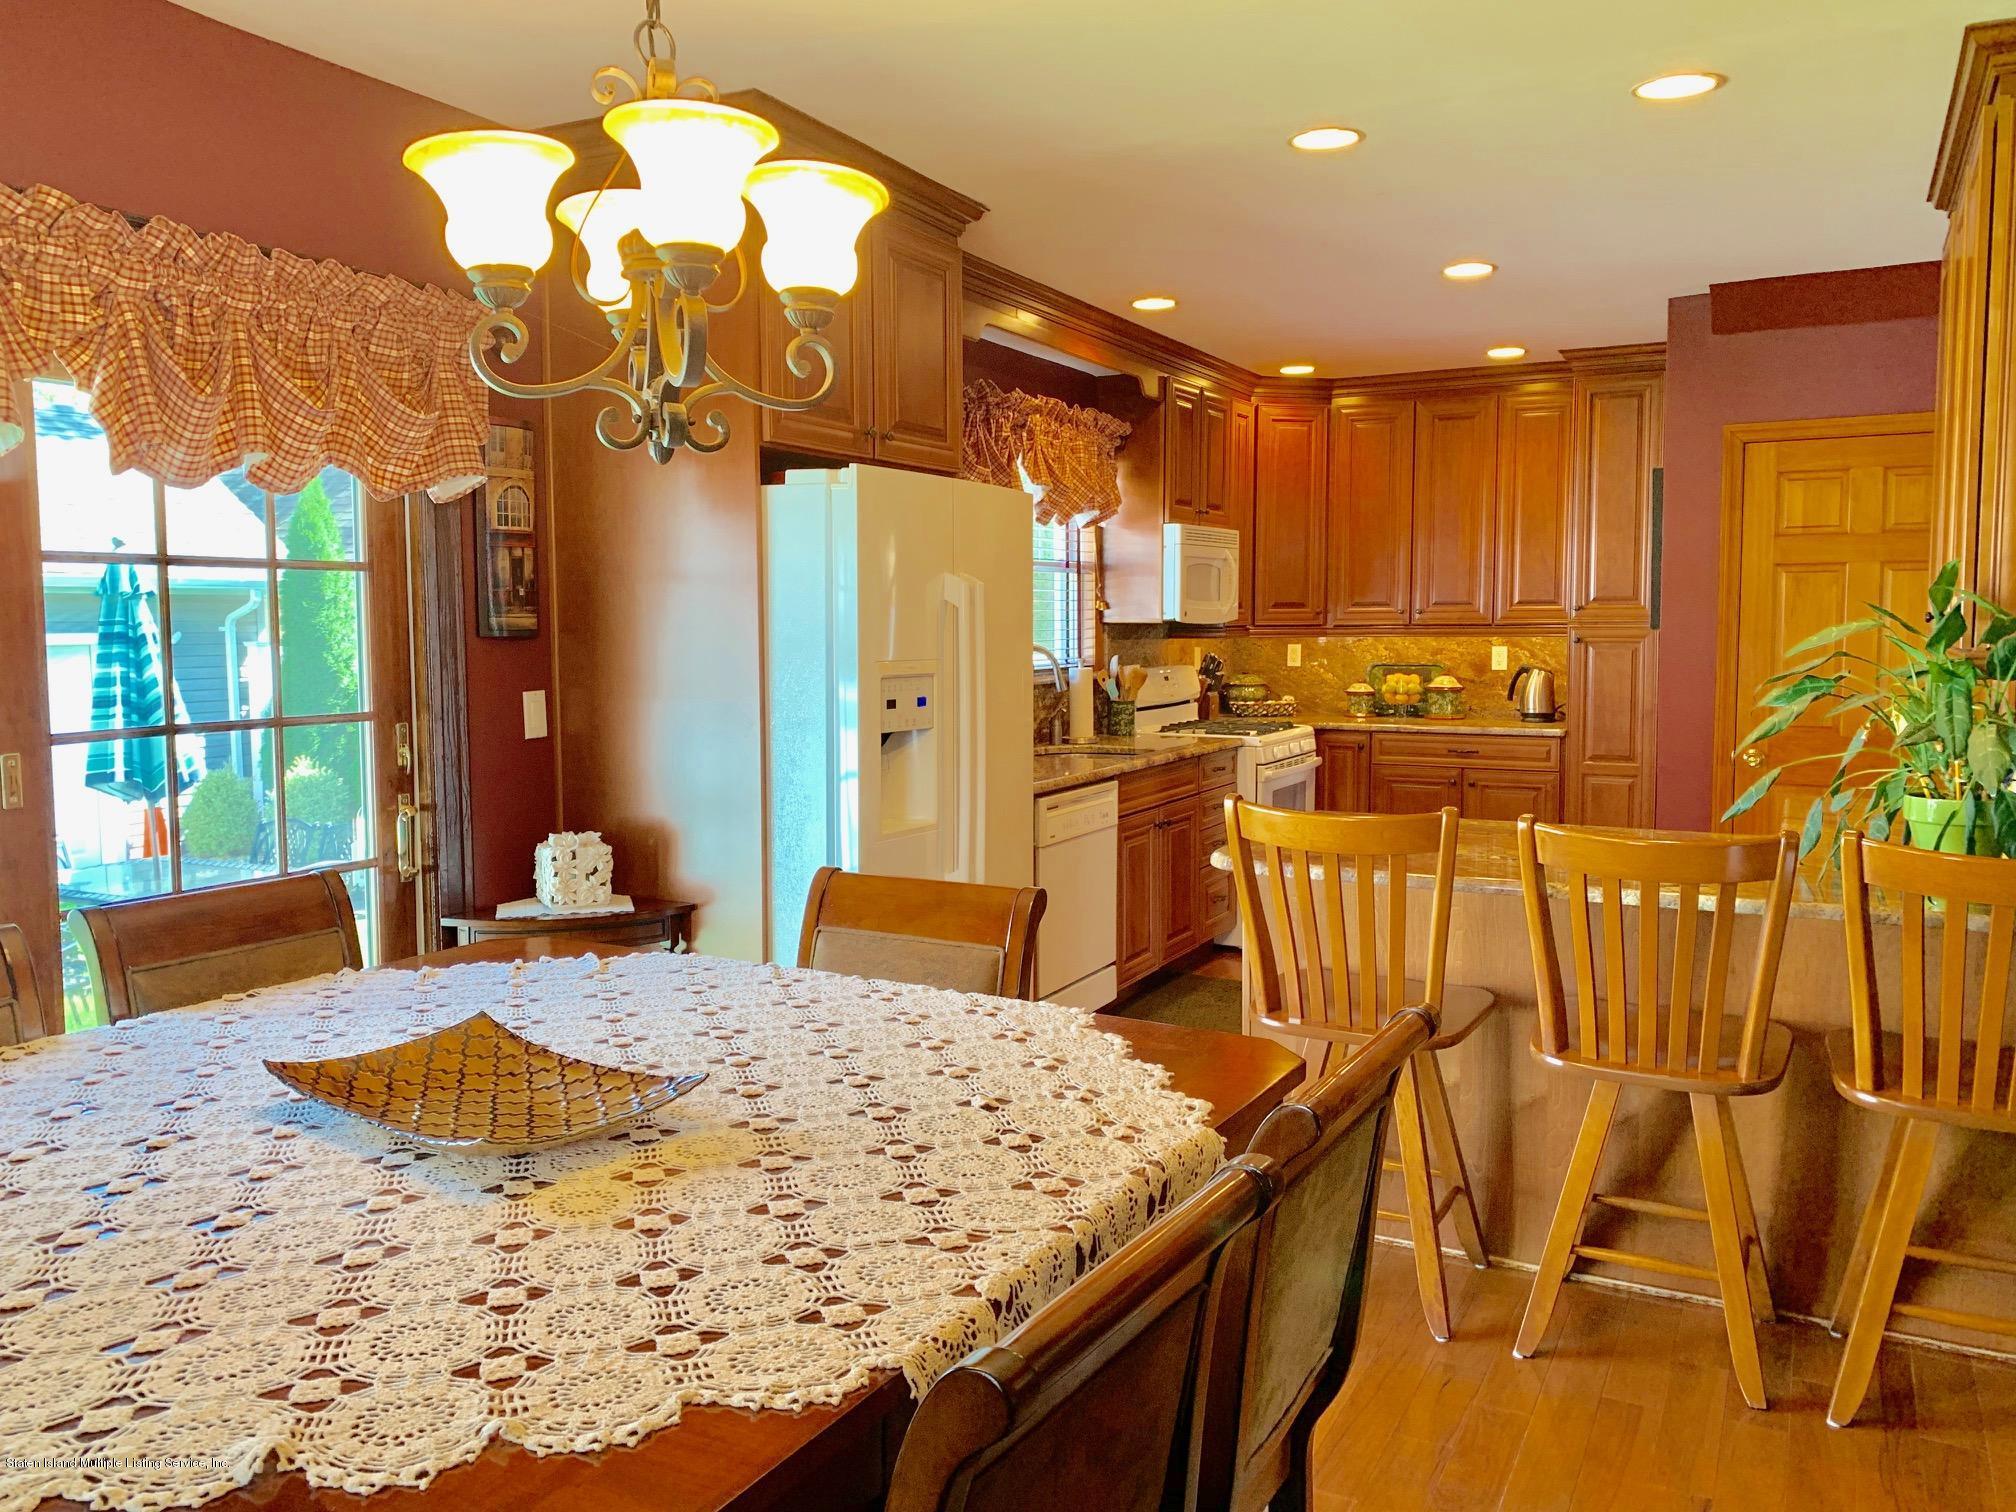 Single Family - Detached 195 Fairview Avenue  Staten Island, NY 10314, MLS-1132423-14